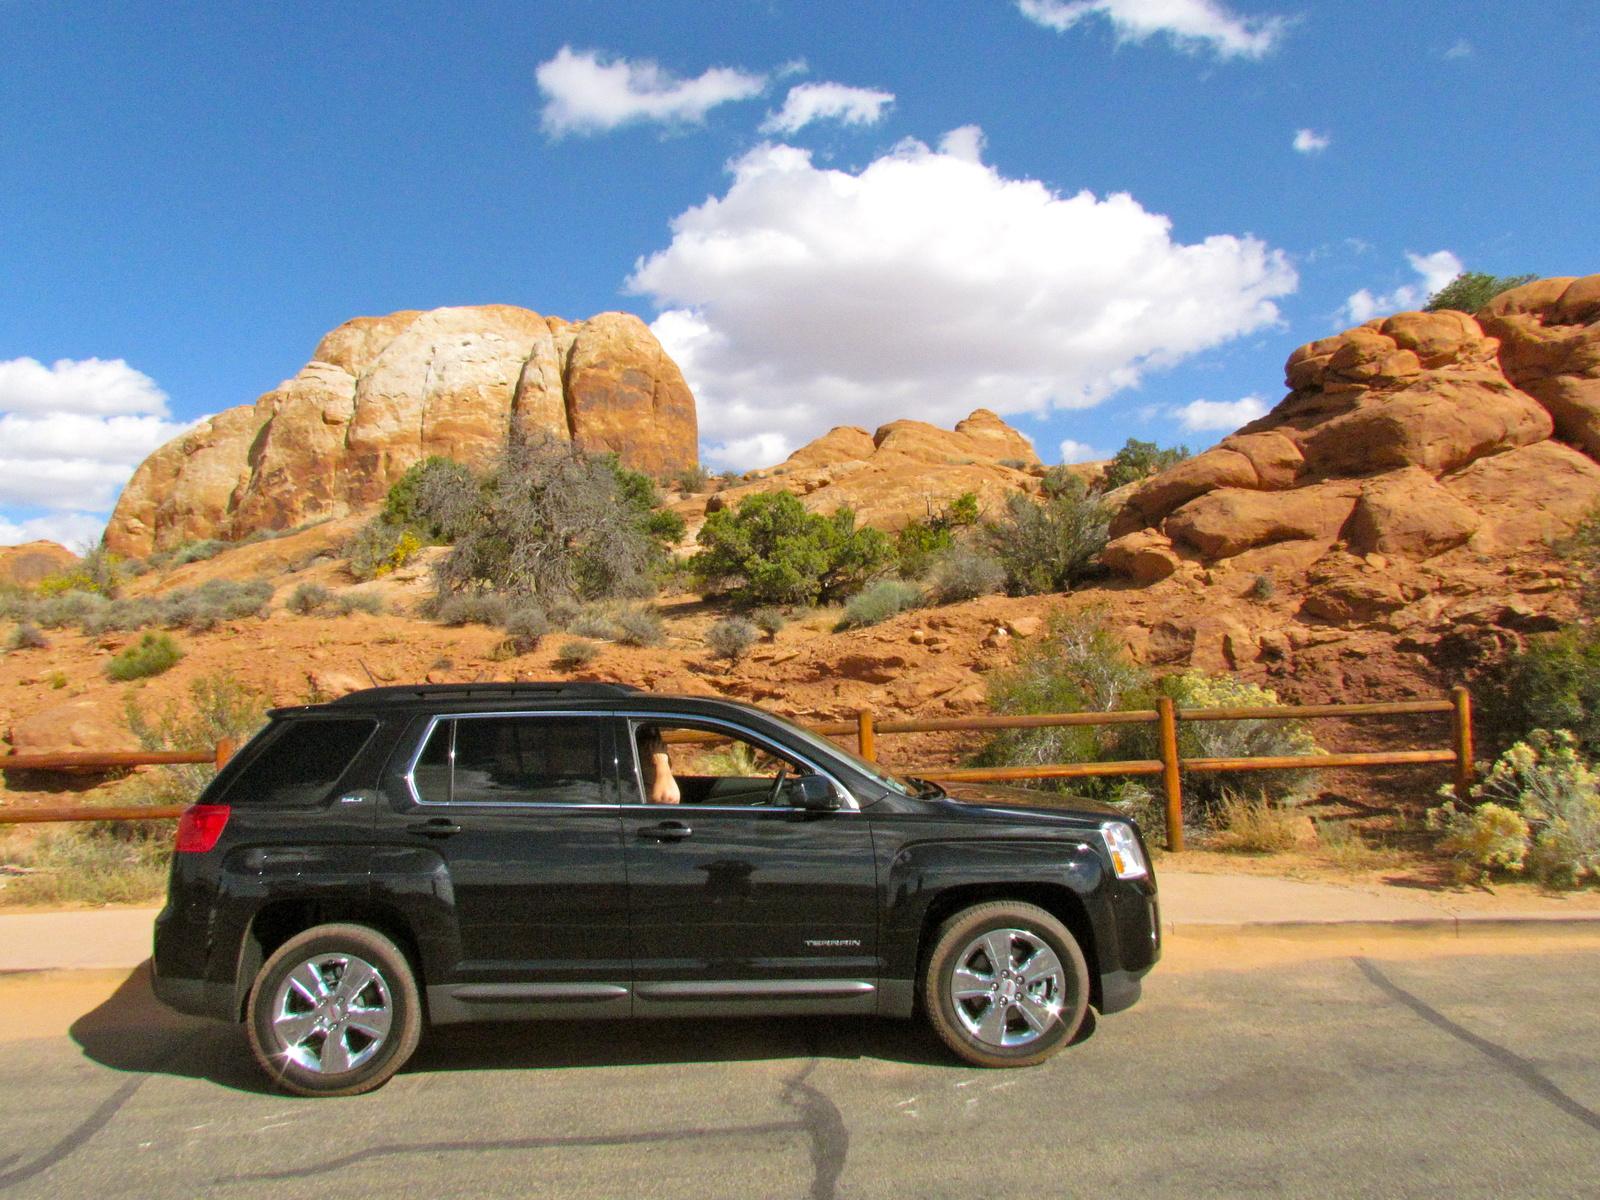 Chevrolet Hhr Questions Where To Check The Transmission Fluid On 2010 Chevy Cobalt Sedan Engine Head Gasket Diagram An Cargurus